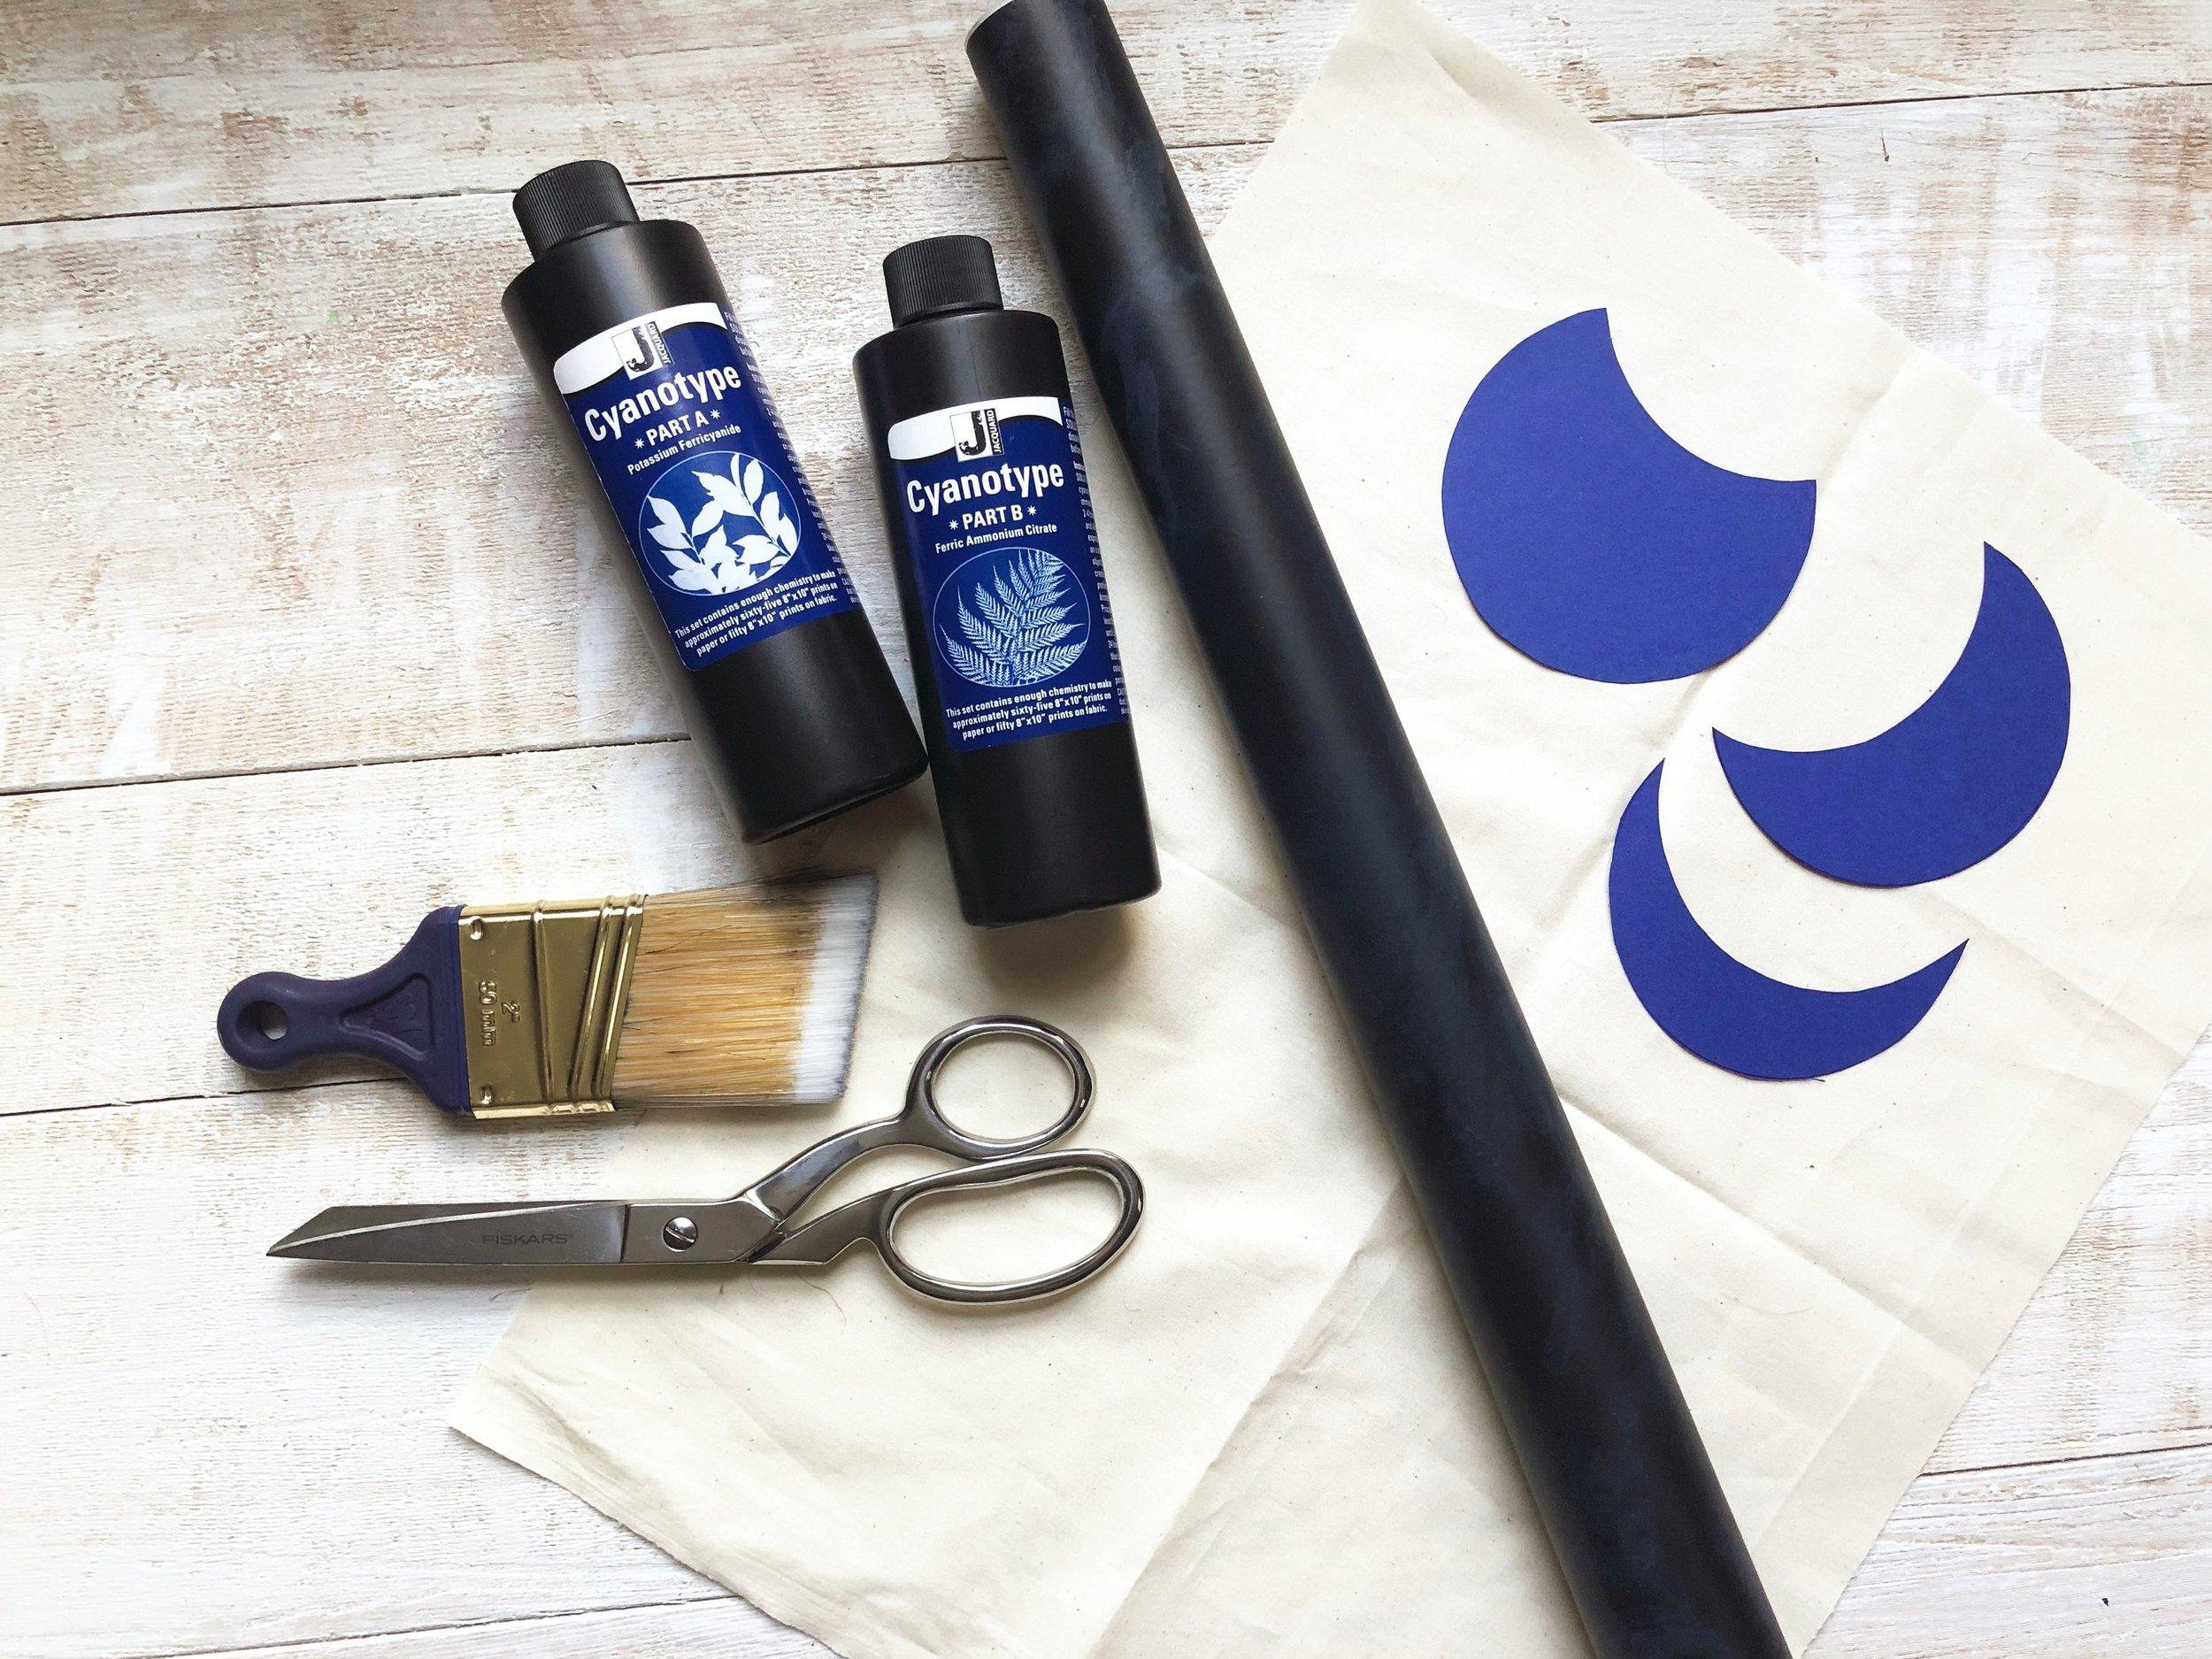 How to Sun Print a Phases of the Moon Wall Art ~ DIY Cyanotype on Fabric #homedecor #wallart #phasesofthemoon #sunprinting #cyanotype #easydiy #mystic #fabric